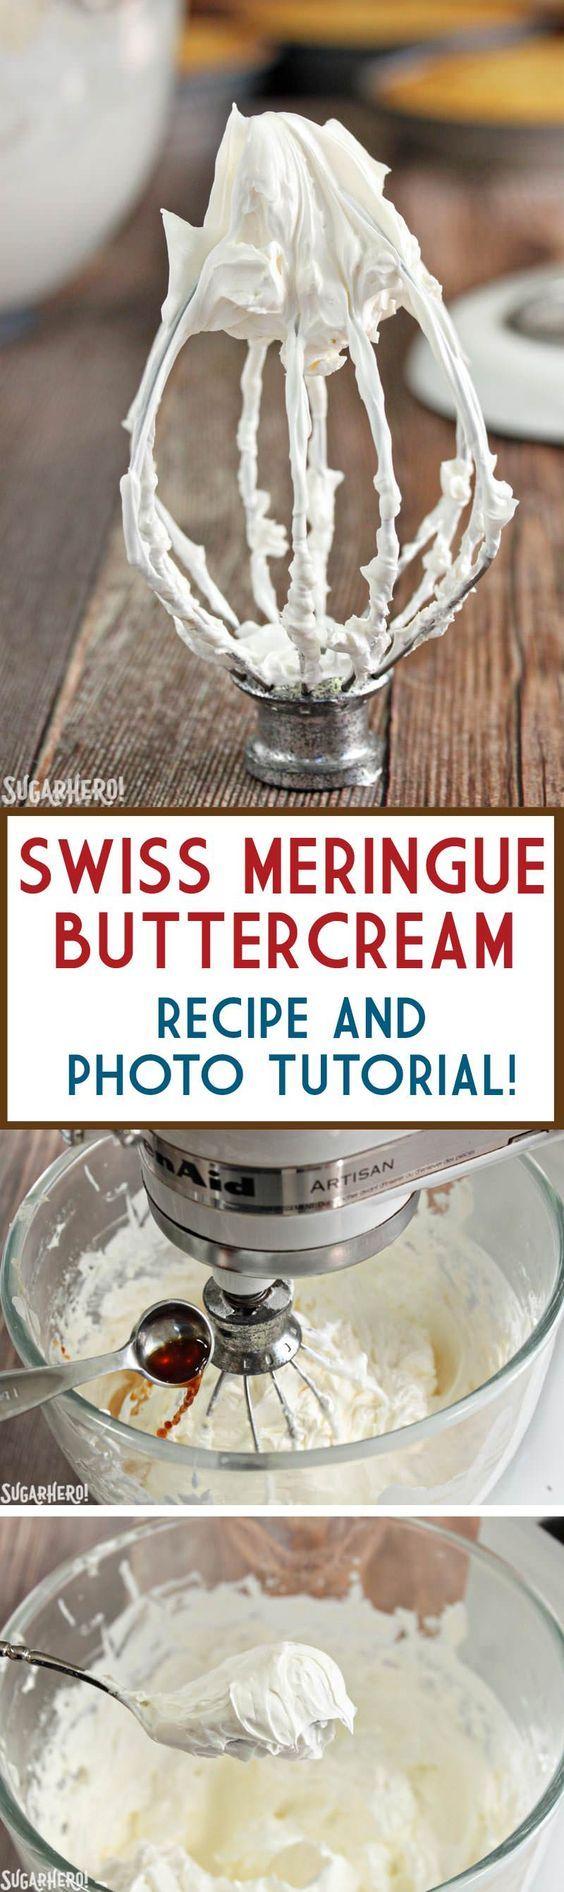 Best 25+ Swiss meringue buttercream ideas on Pinterest ...